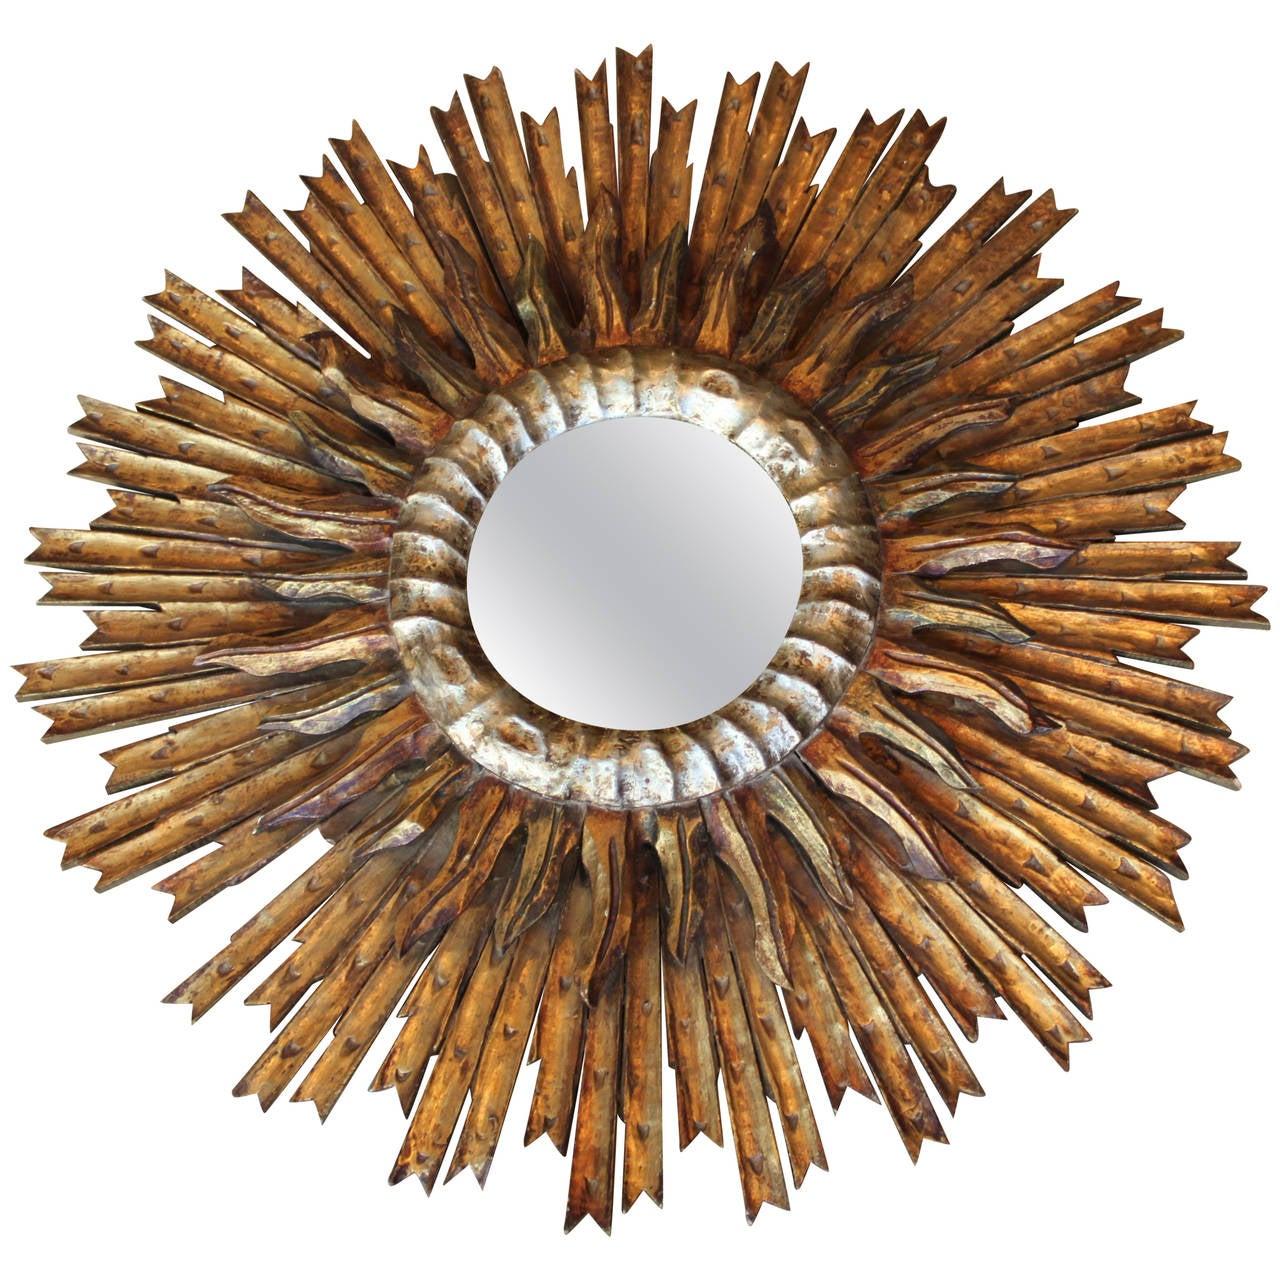 French gold and silver sunburst or starburst convex mirror for Sunburst mirror